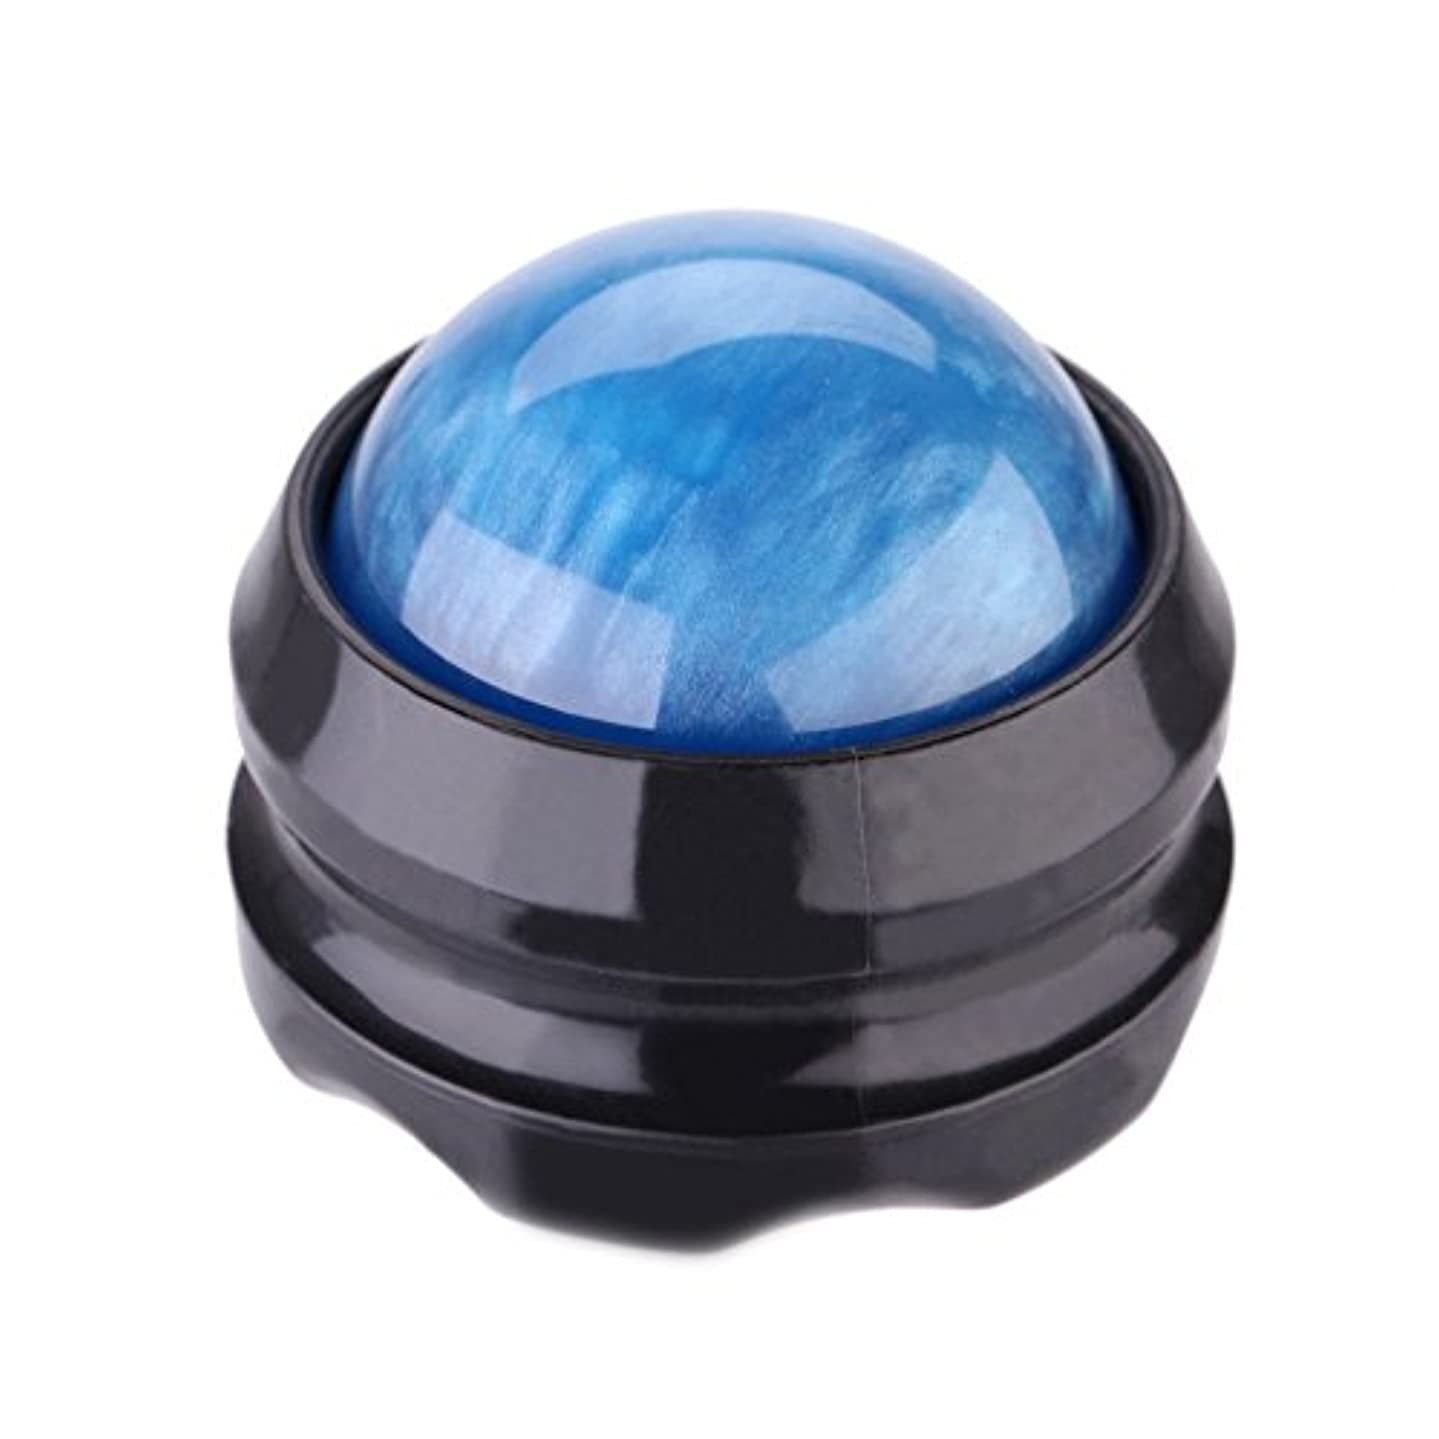 gundoop マッサージ ボール 360度回転 背中 首 腰 筋膜リリース 健康器具 (青)